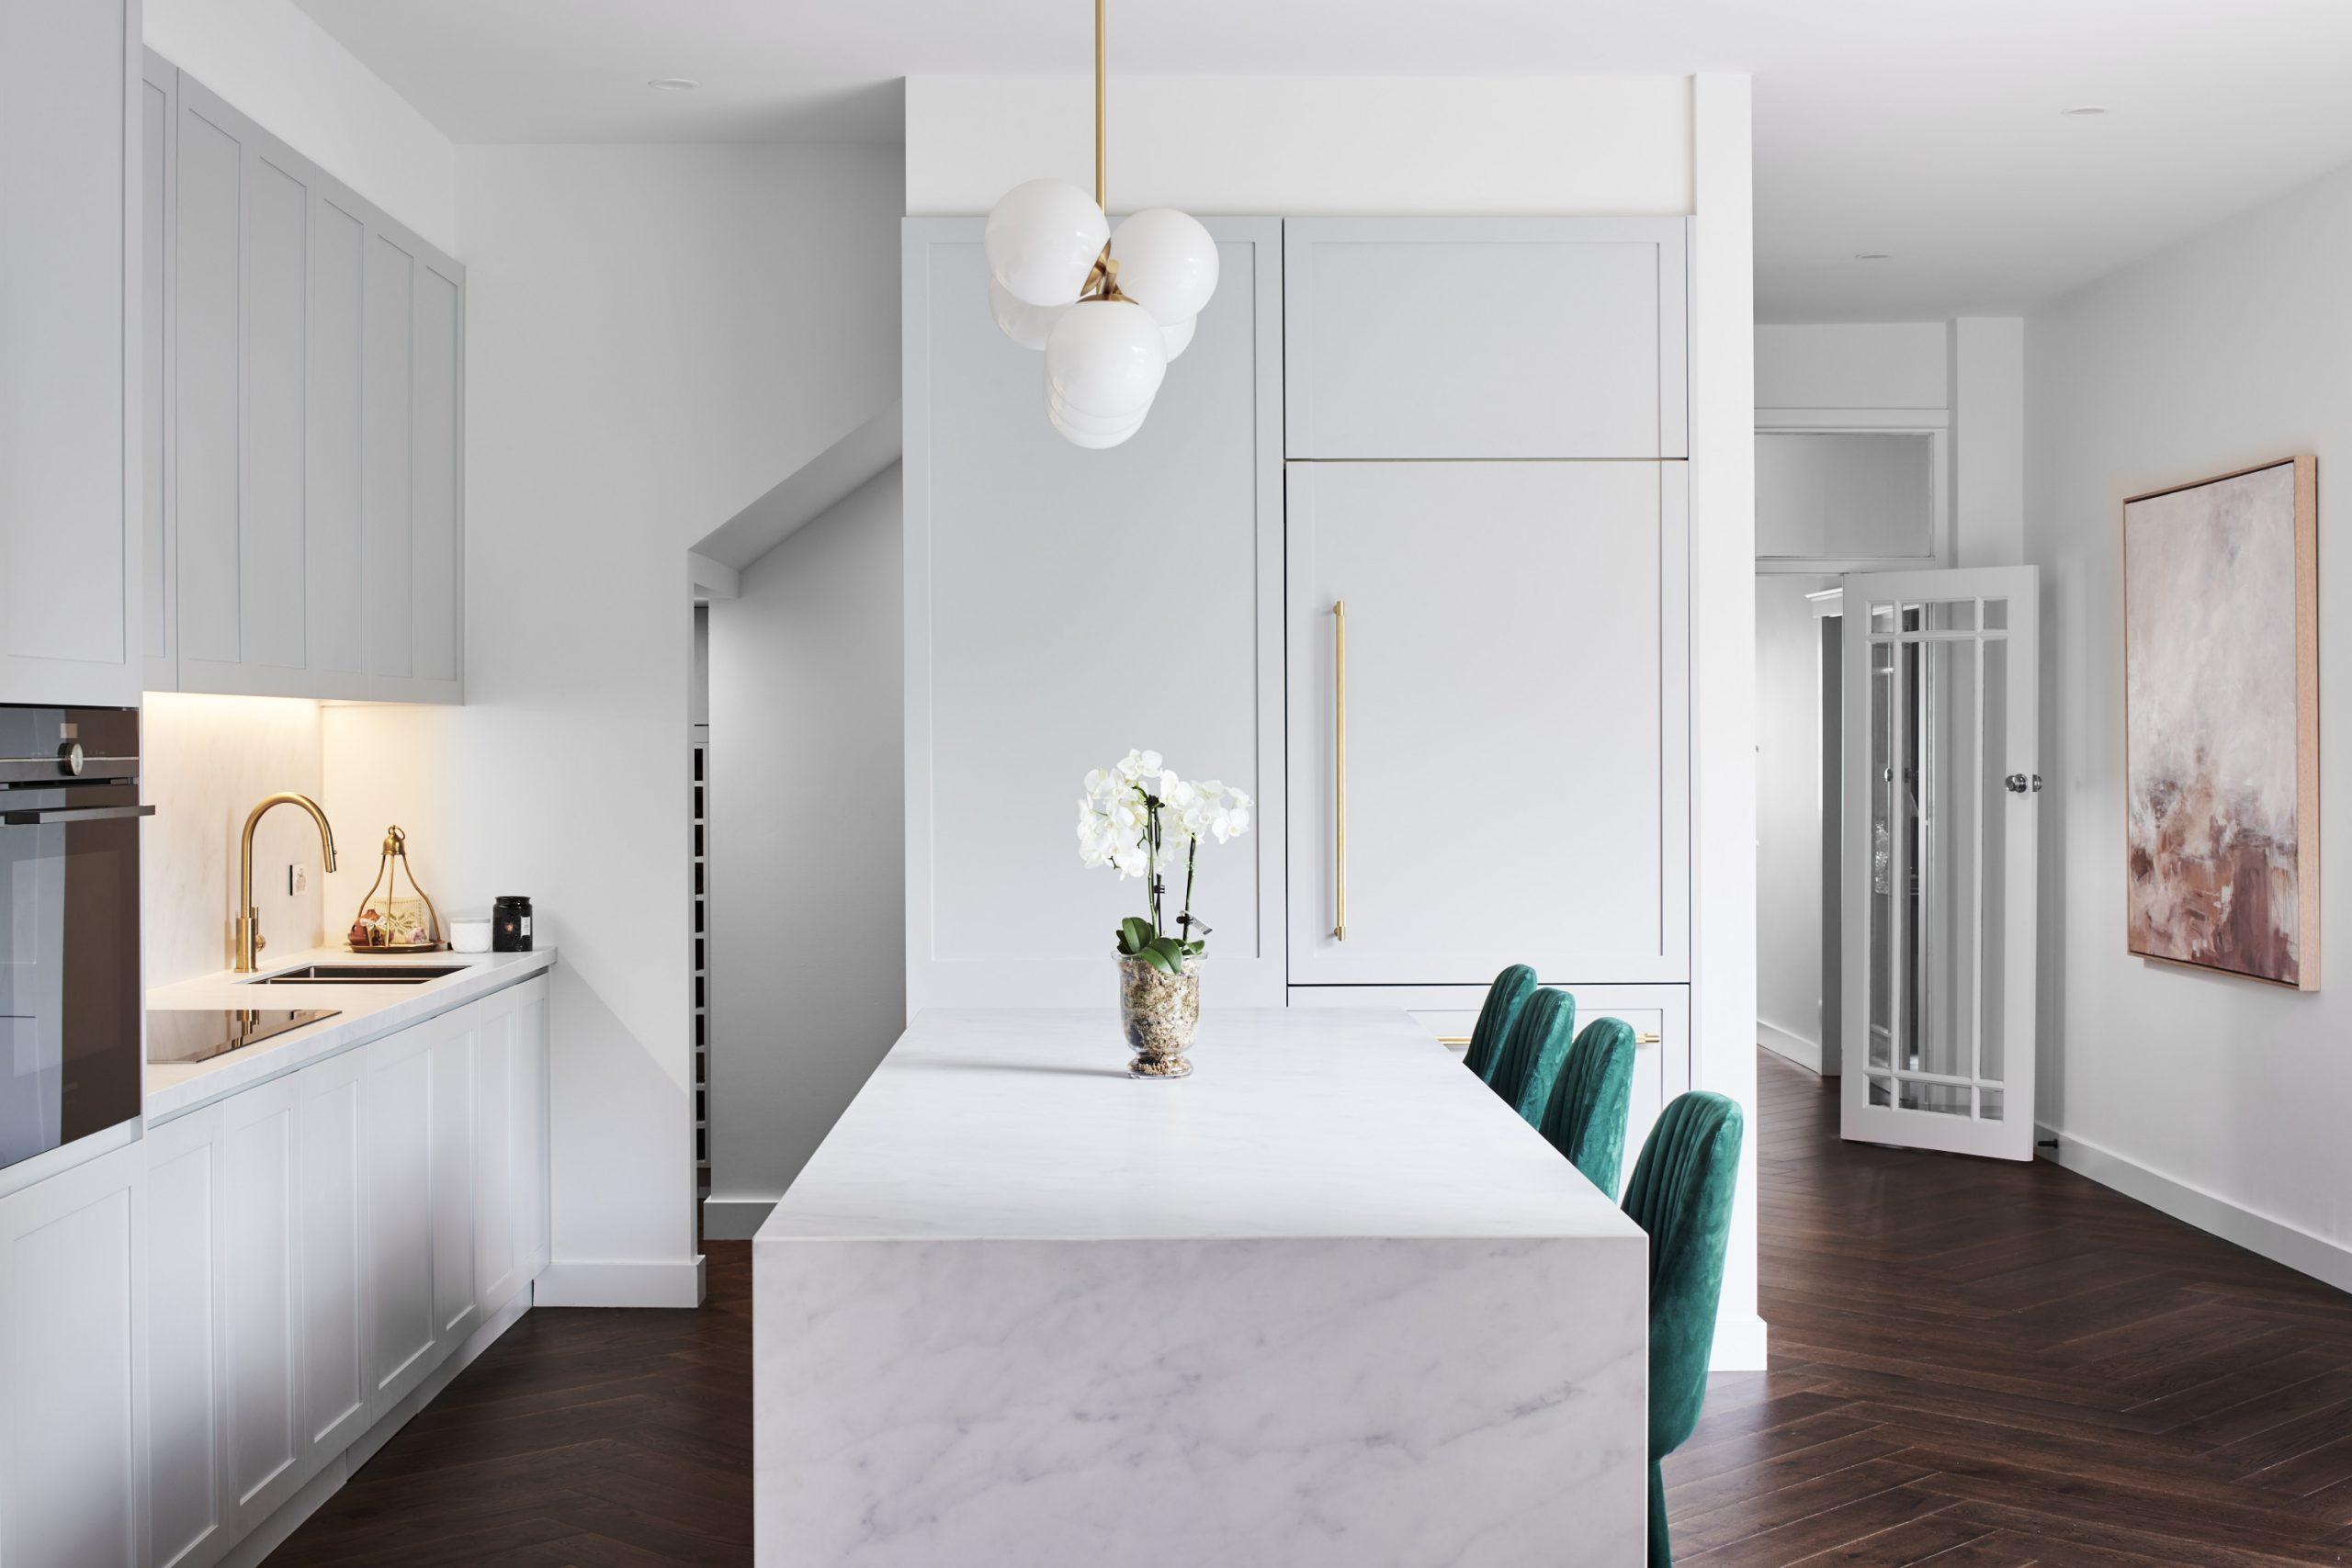 Warm fixtures and warm tones for interiors